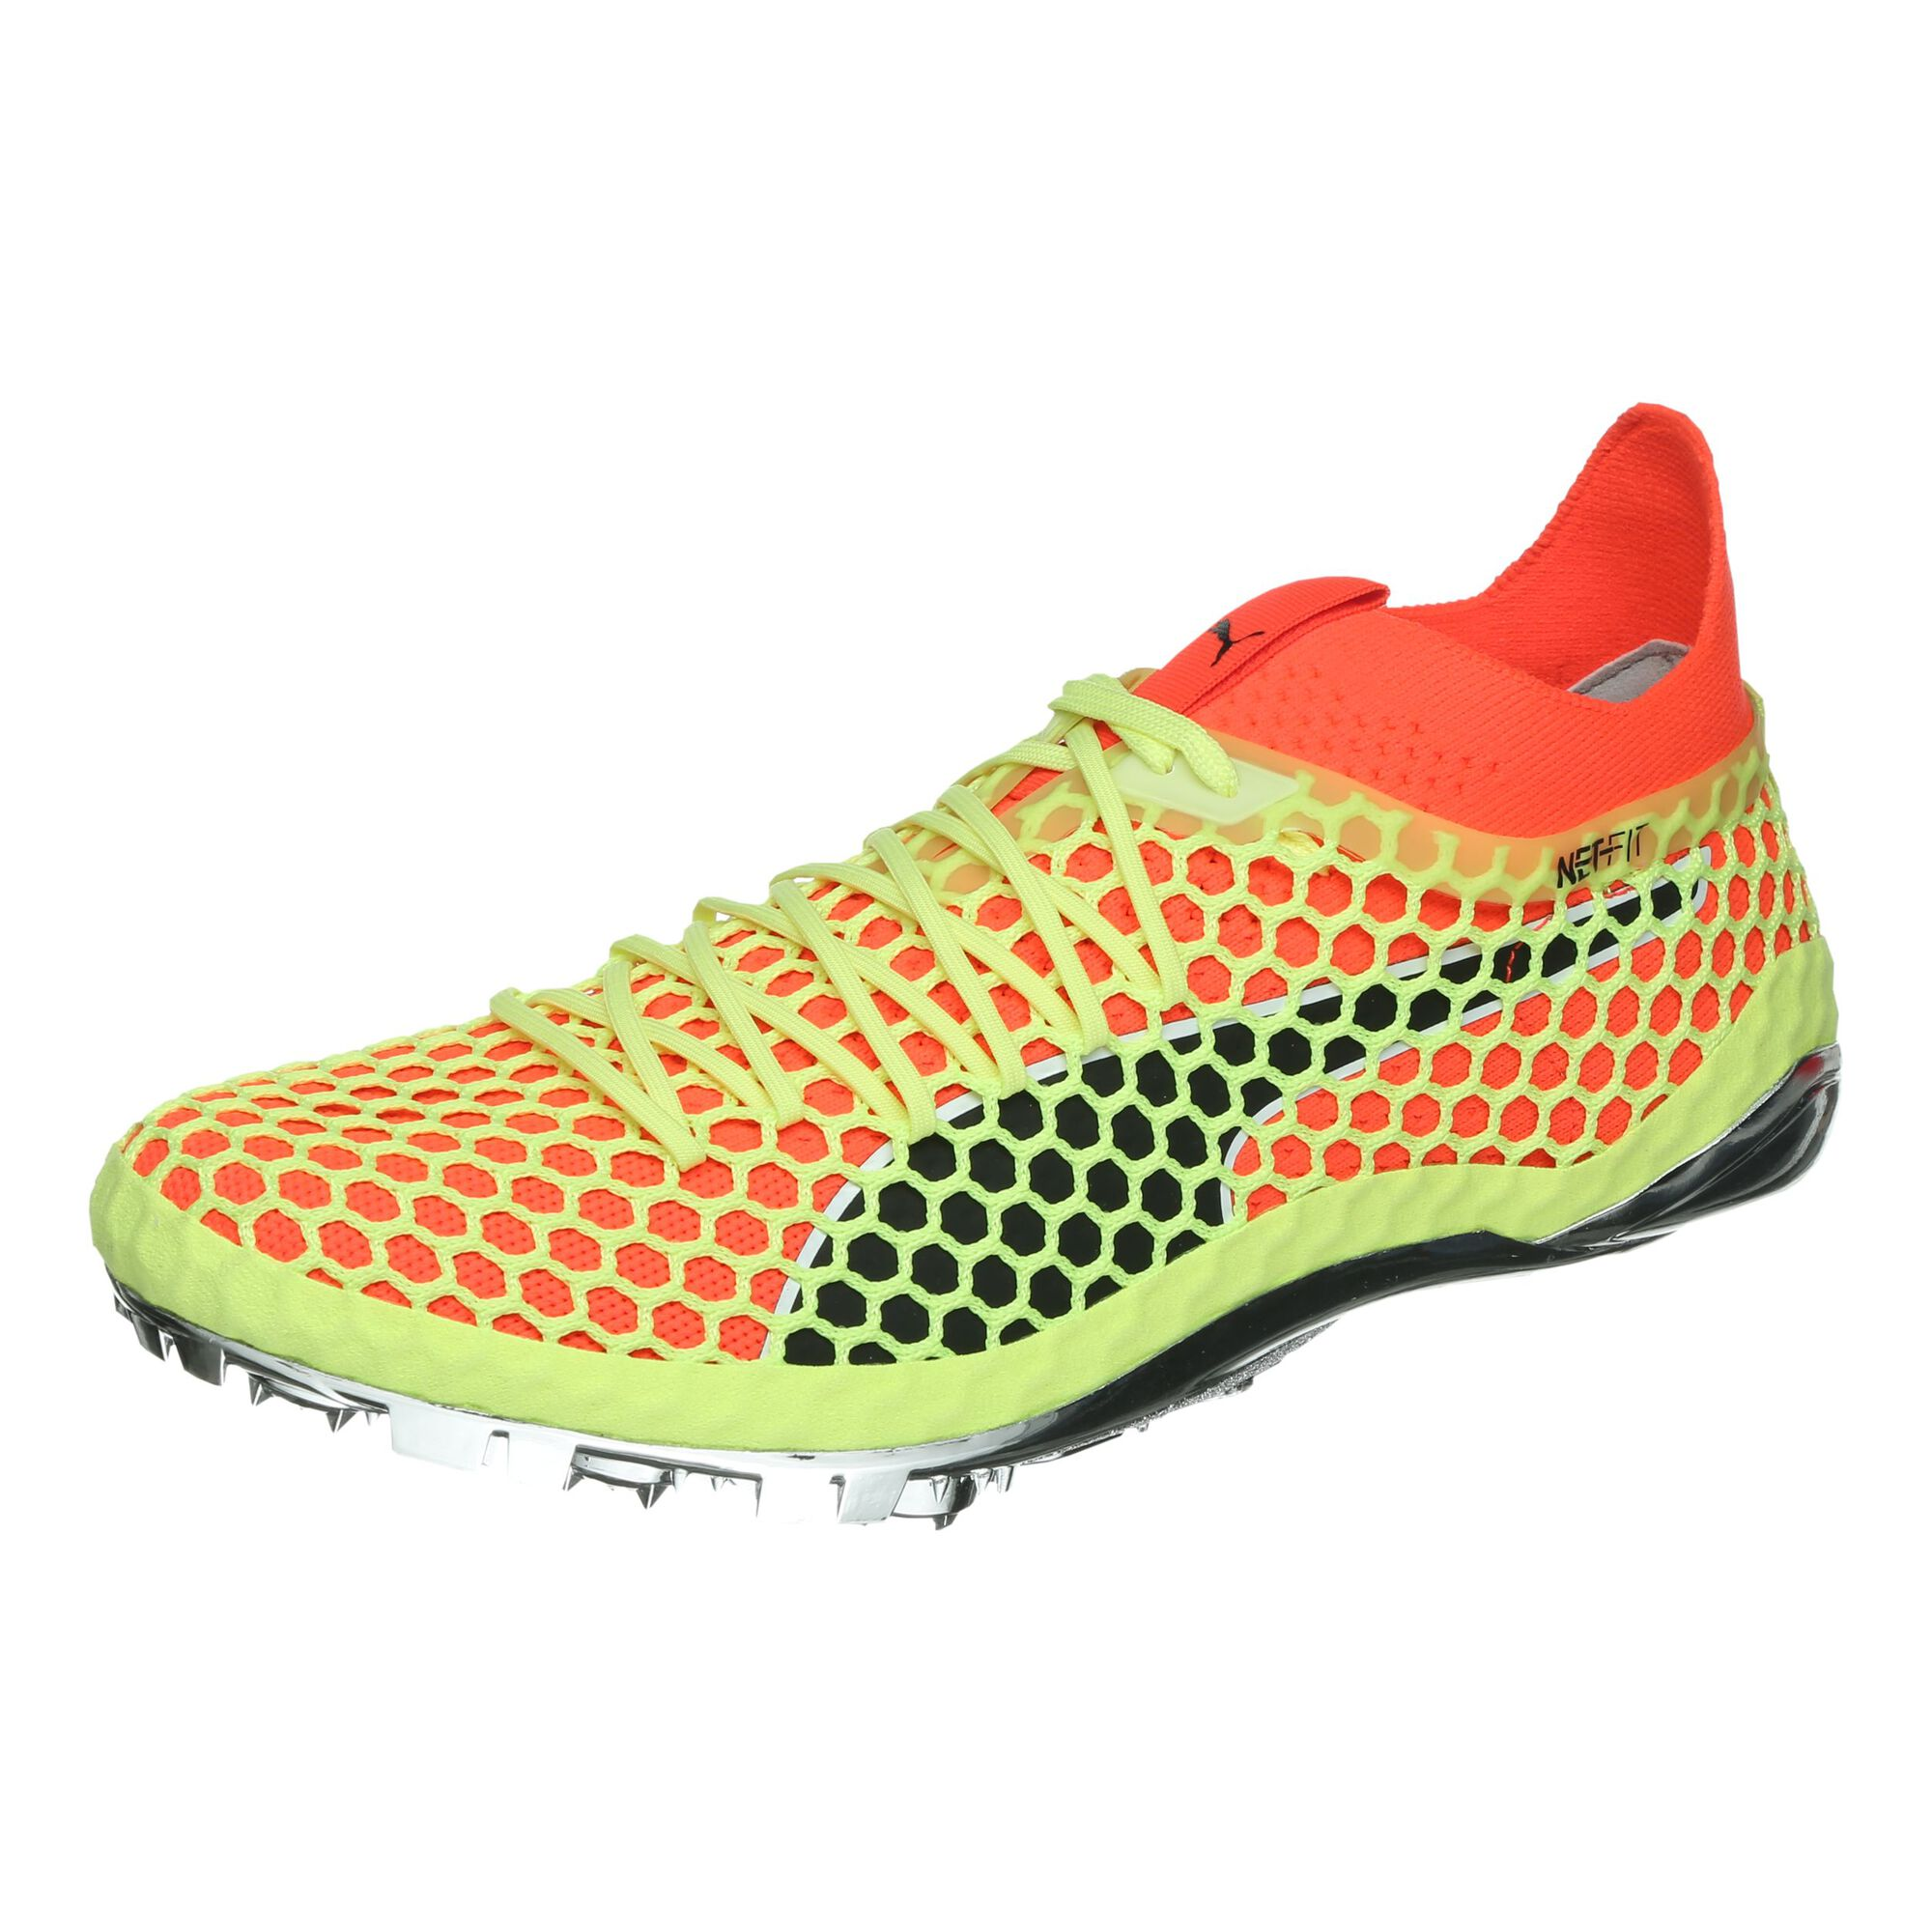 buy Puma EvoSPEED NETFIT Sprint Spike Shoes Men - Neon Yellow ... 4cc6d76e4